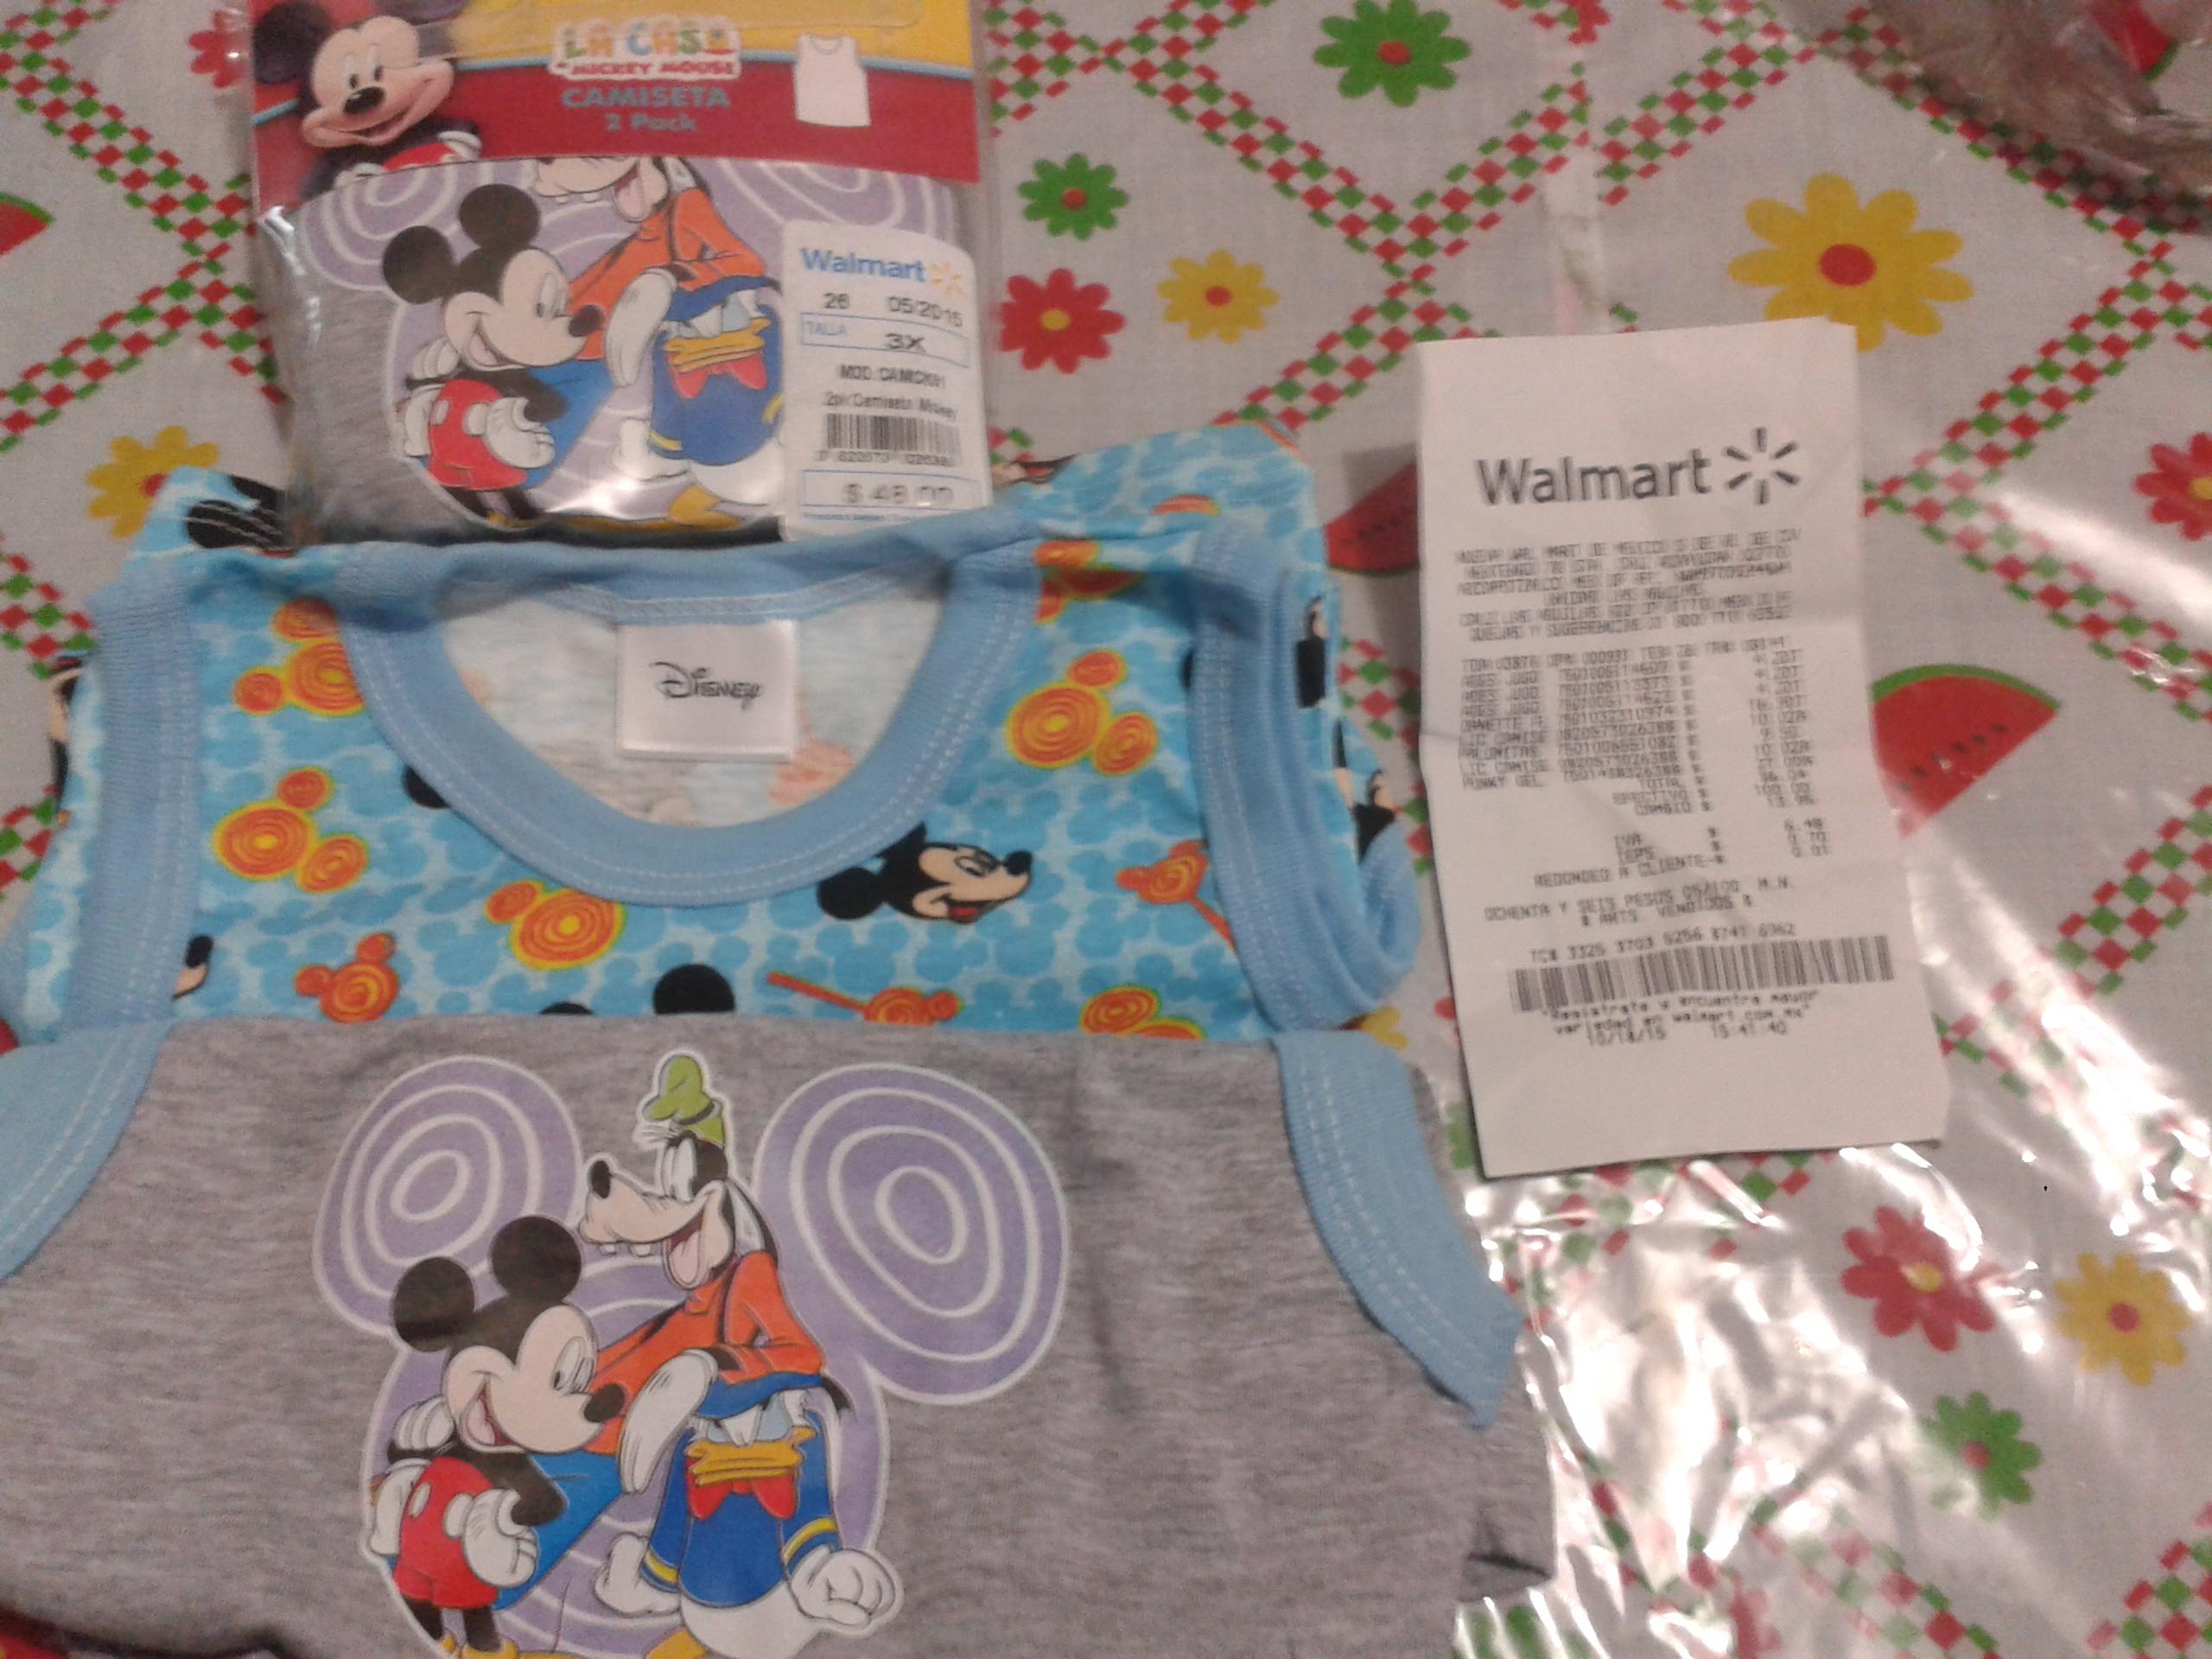 Walmart (DF): paquete 2 camisetas Disney $10.02